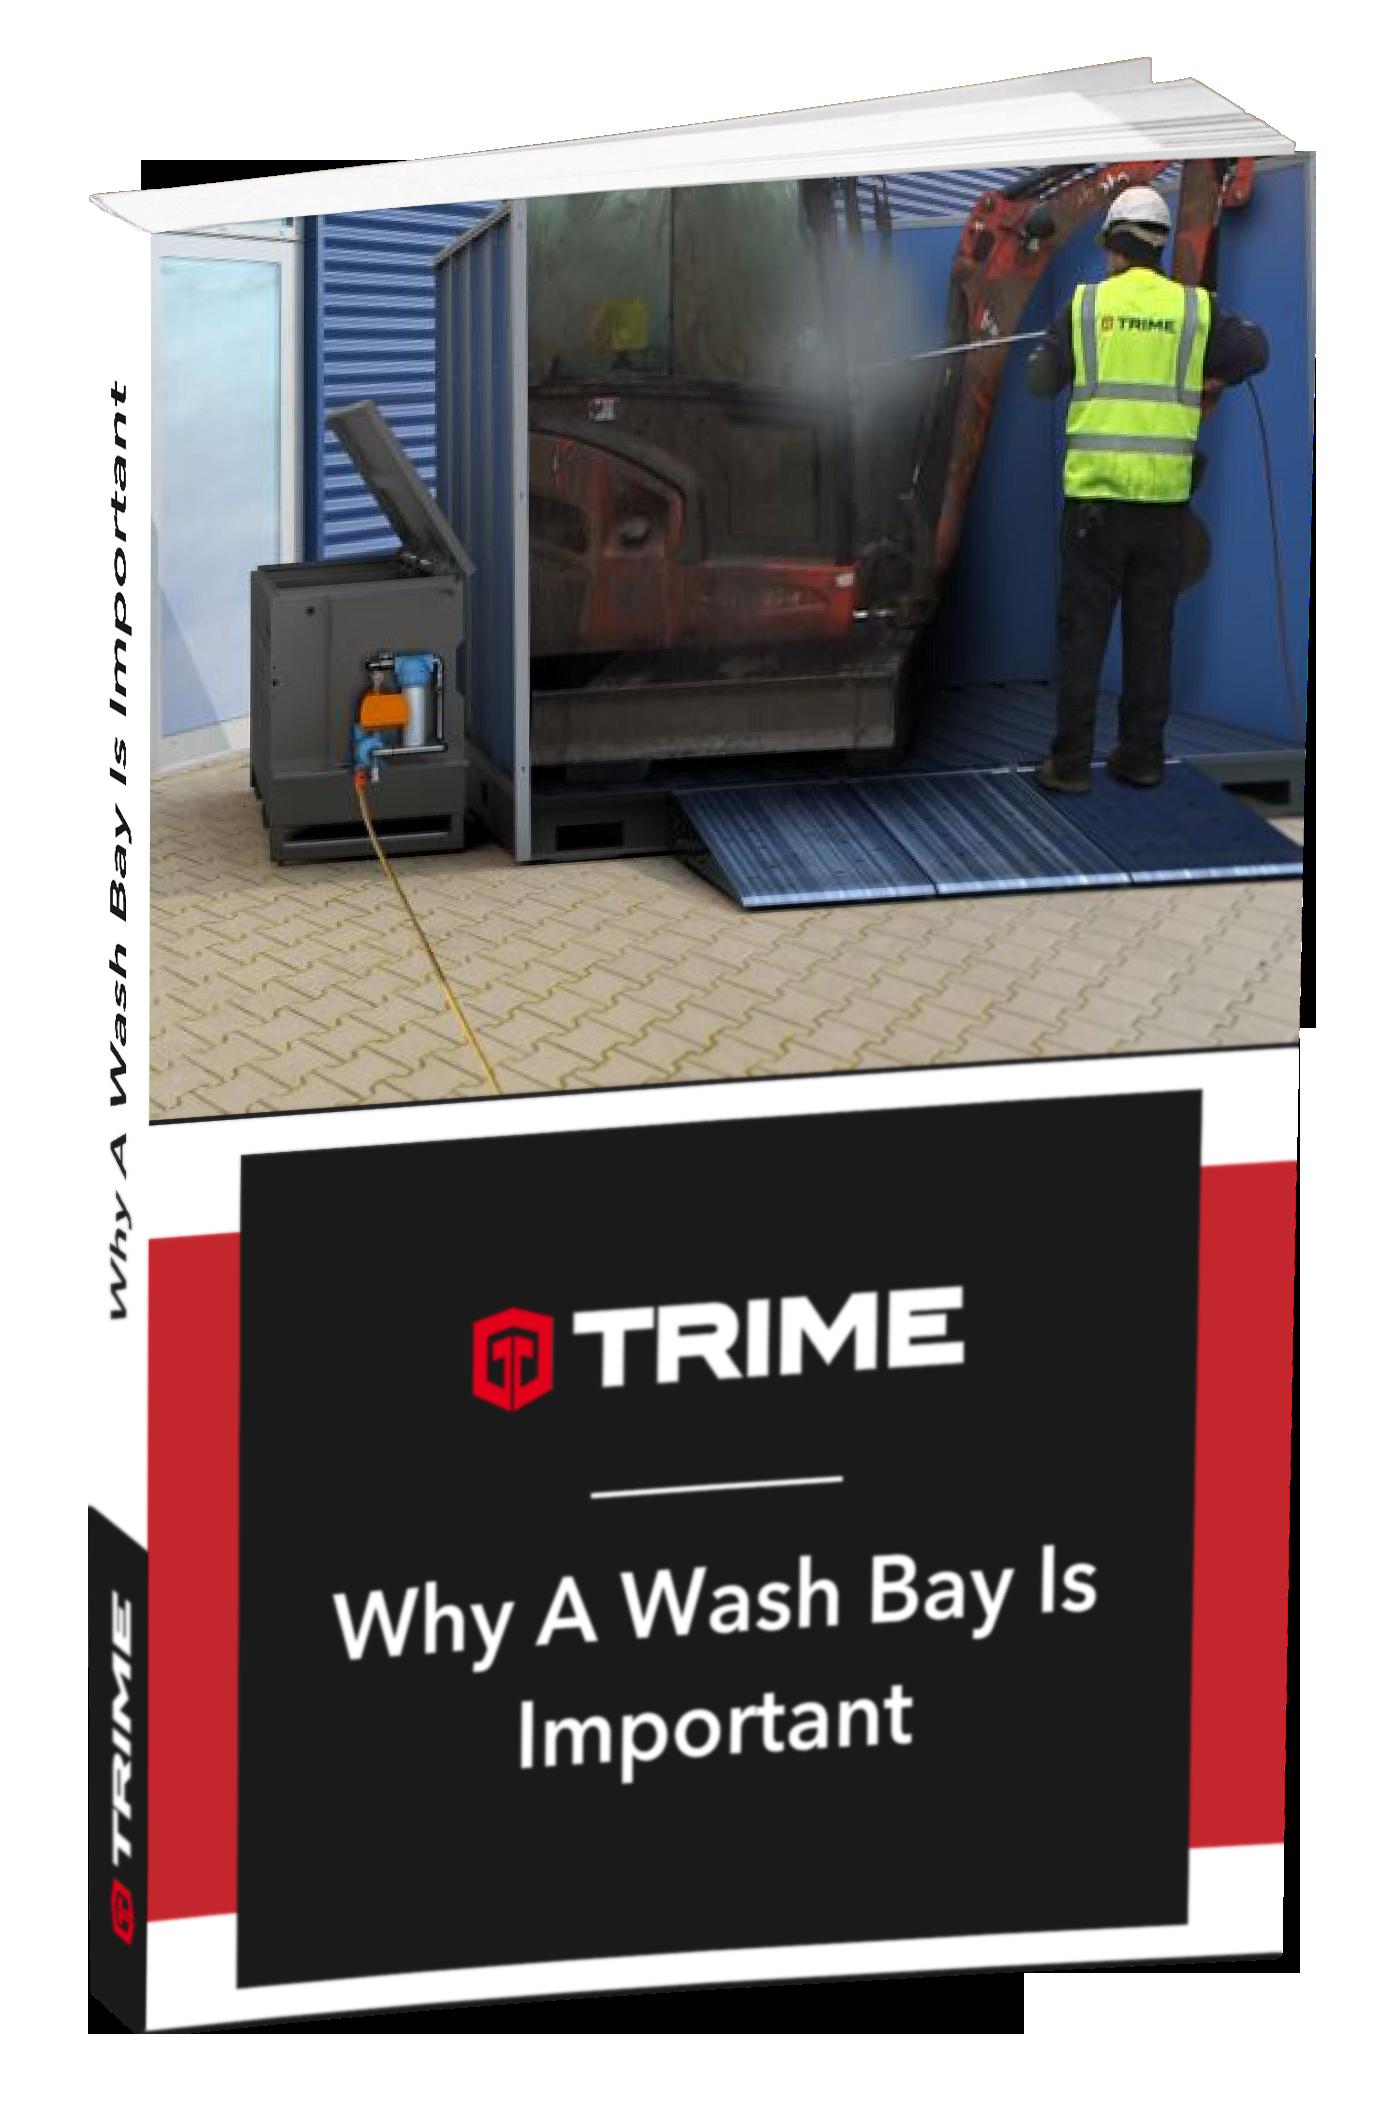 Trime wash bay guide mockup